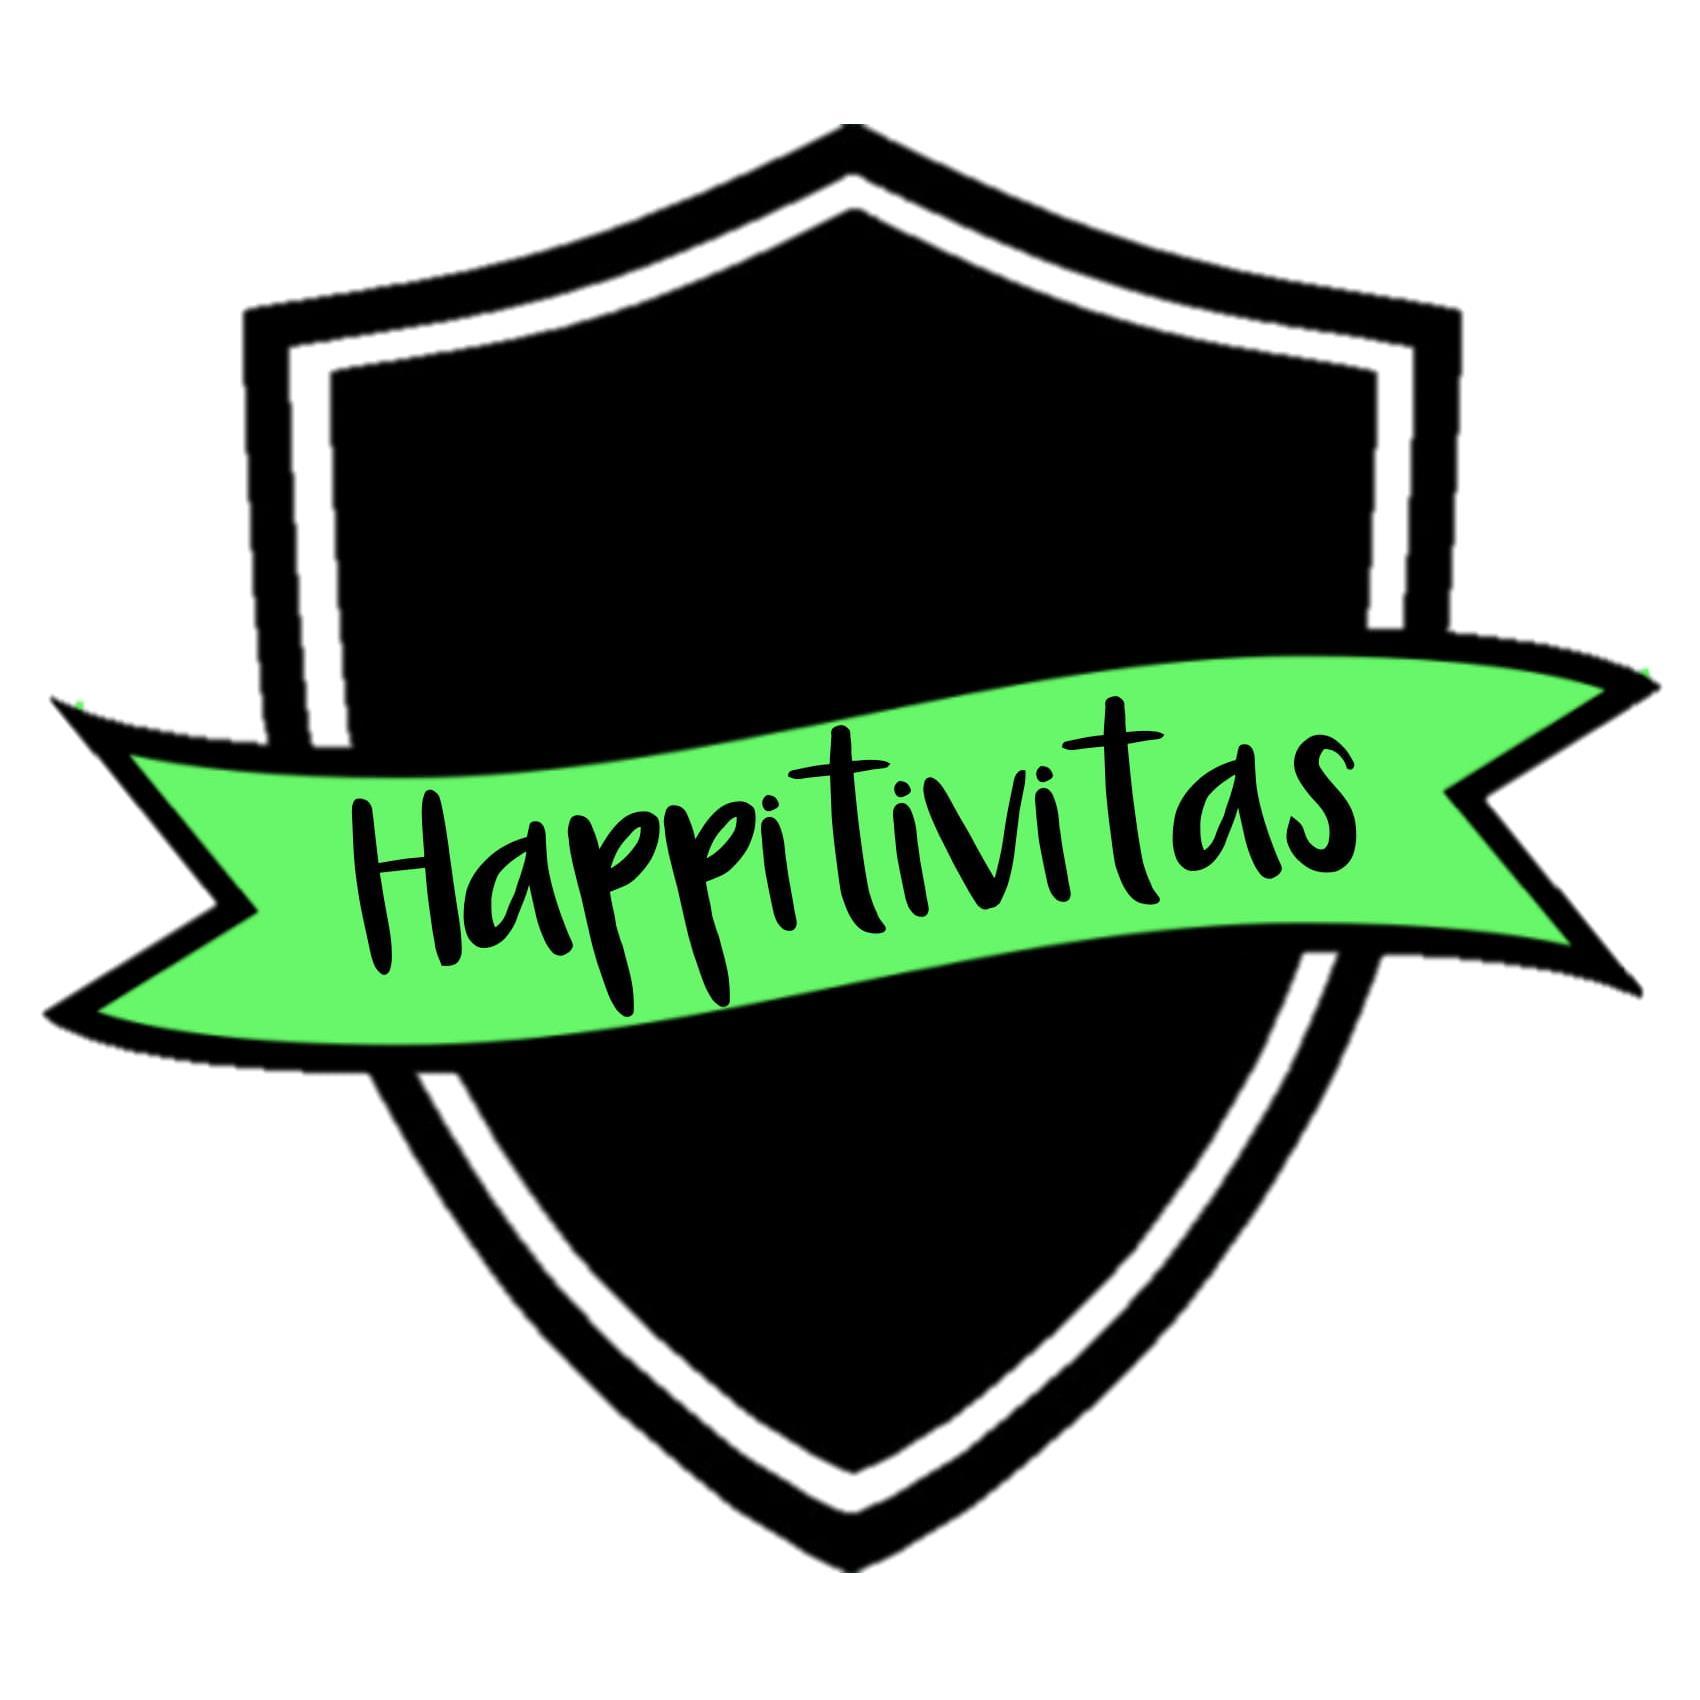 Happitivitas